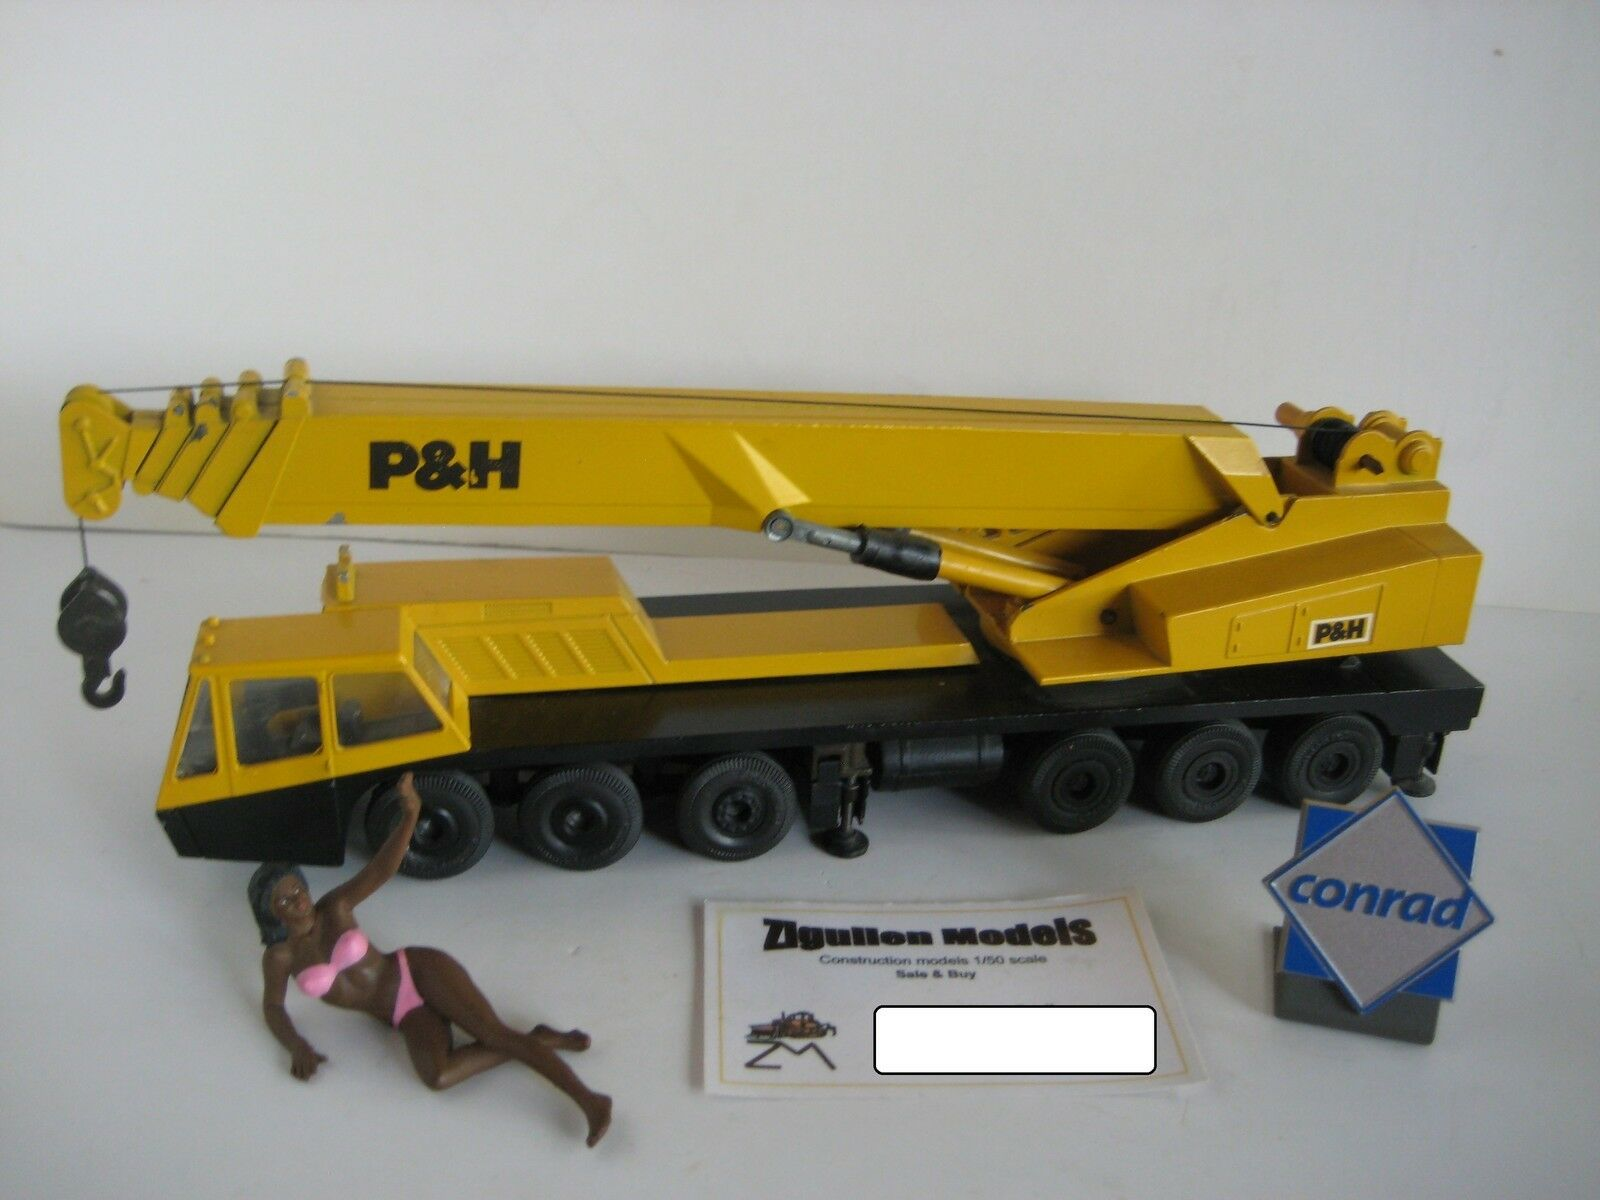 P&h t-1300 Autokran métal jantes  3071.1 d'1 50